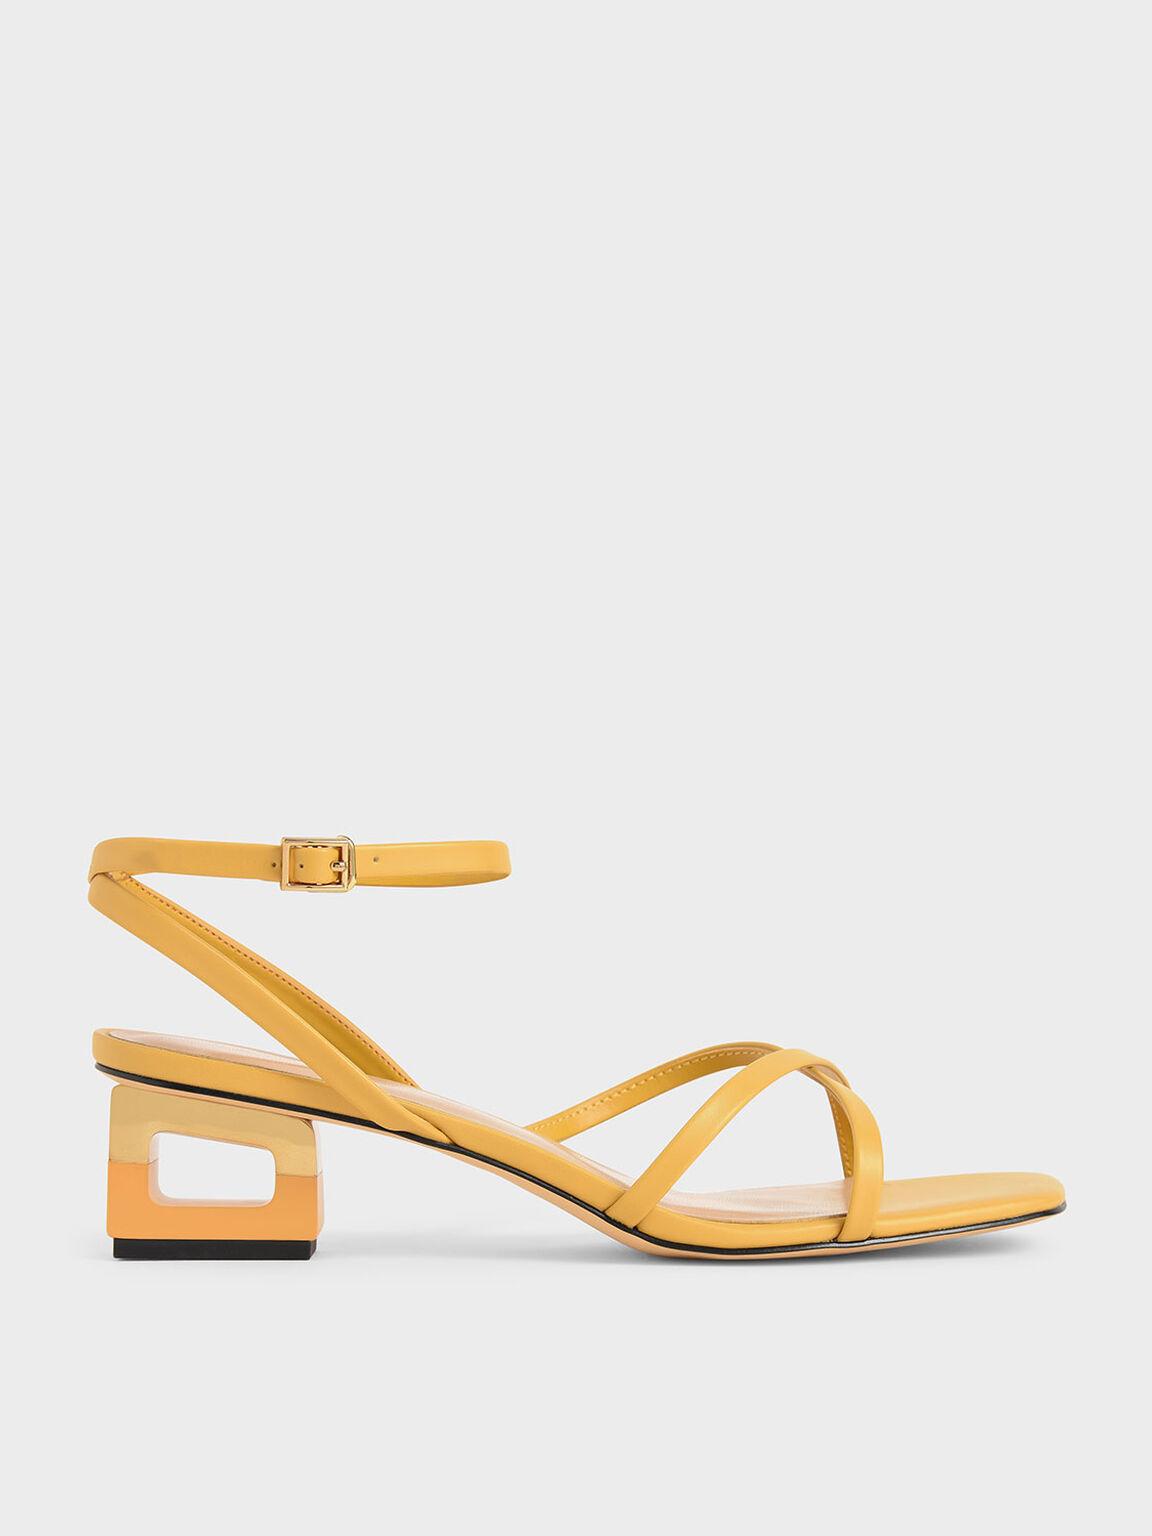 交叉帶方頭涼鞋, 黃色, hi-res